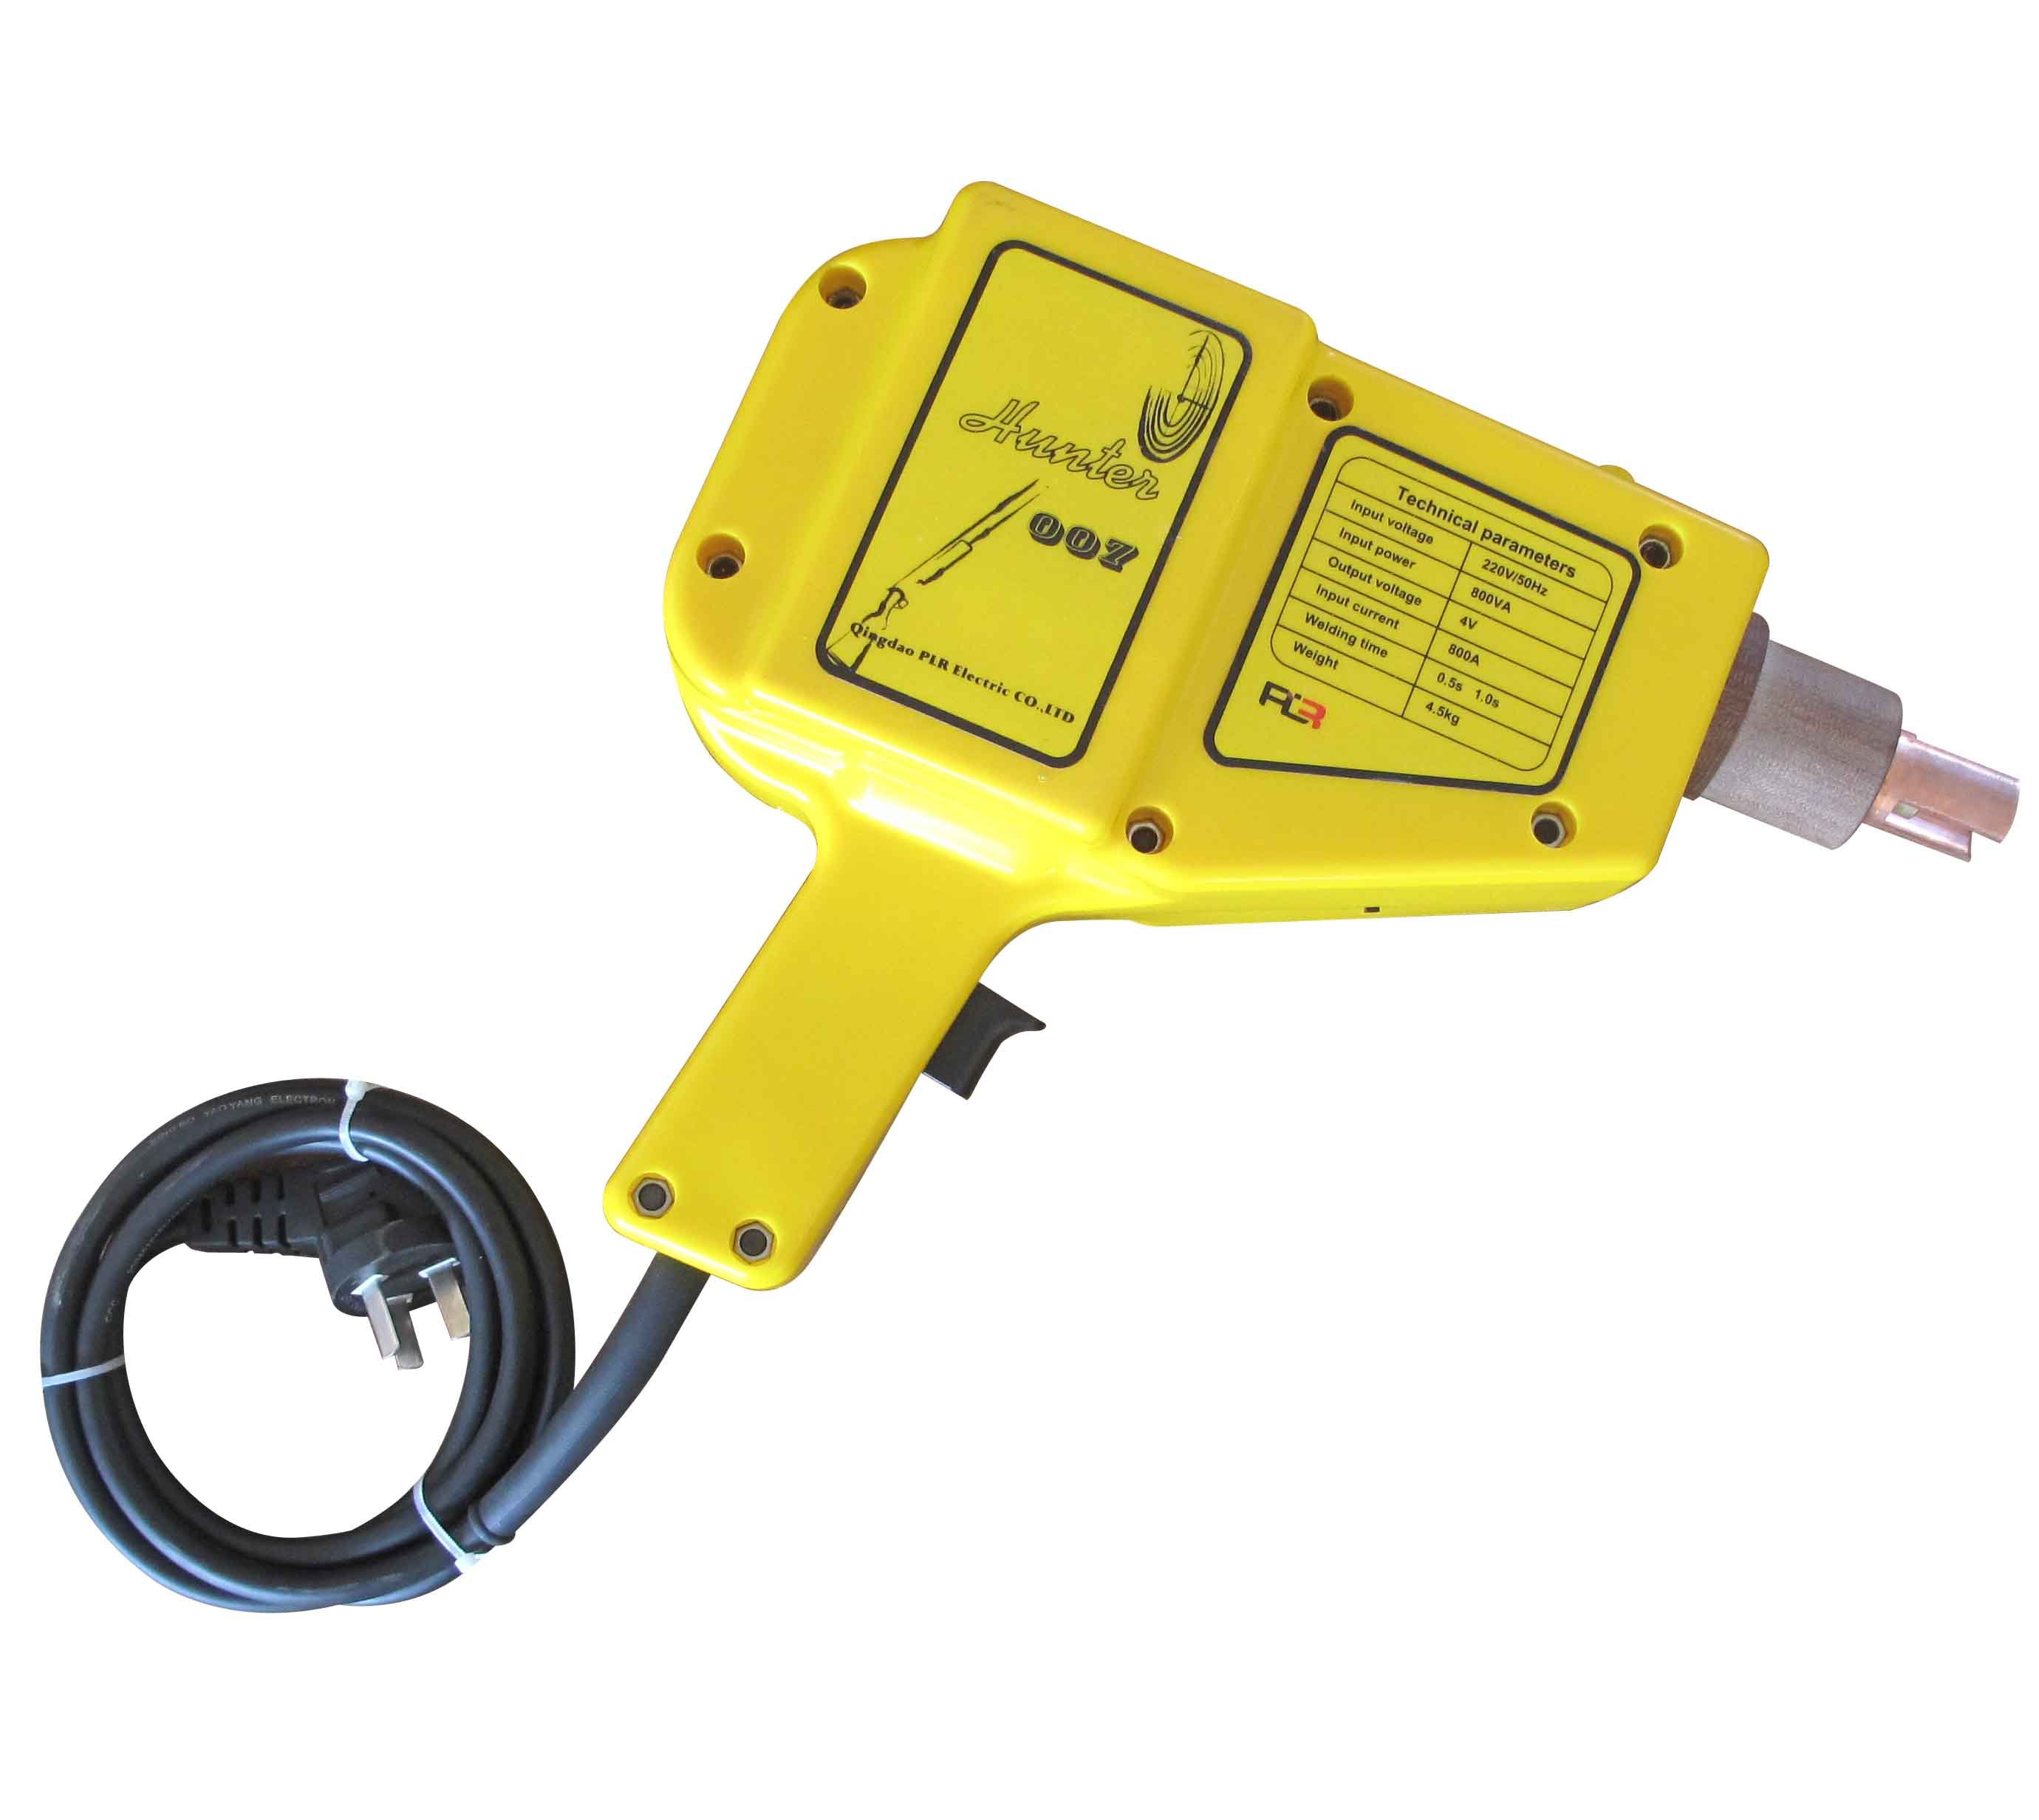 Mini Spot Welding Machine Dent Puller Car Body Repair Spot Welder Machine Scale Machine Productmachine Cotton Aliexpress